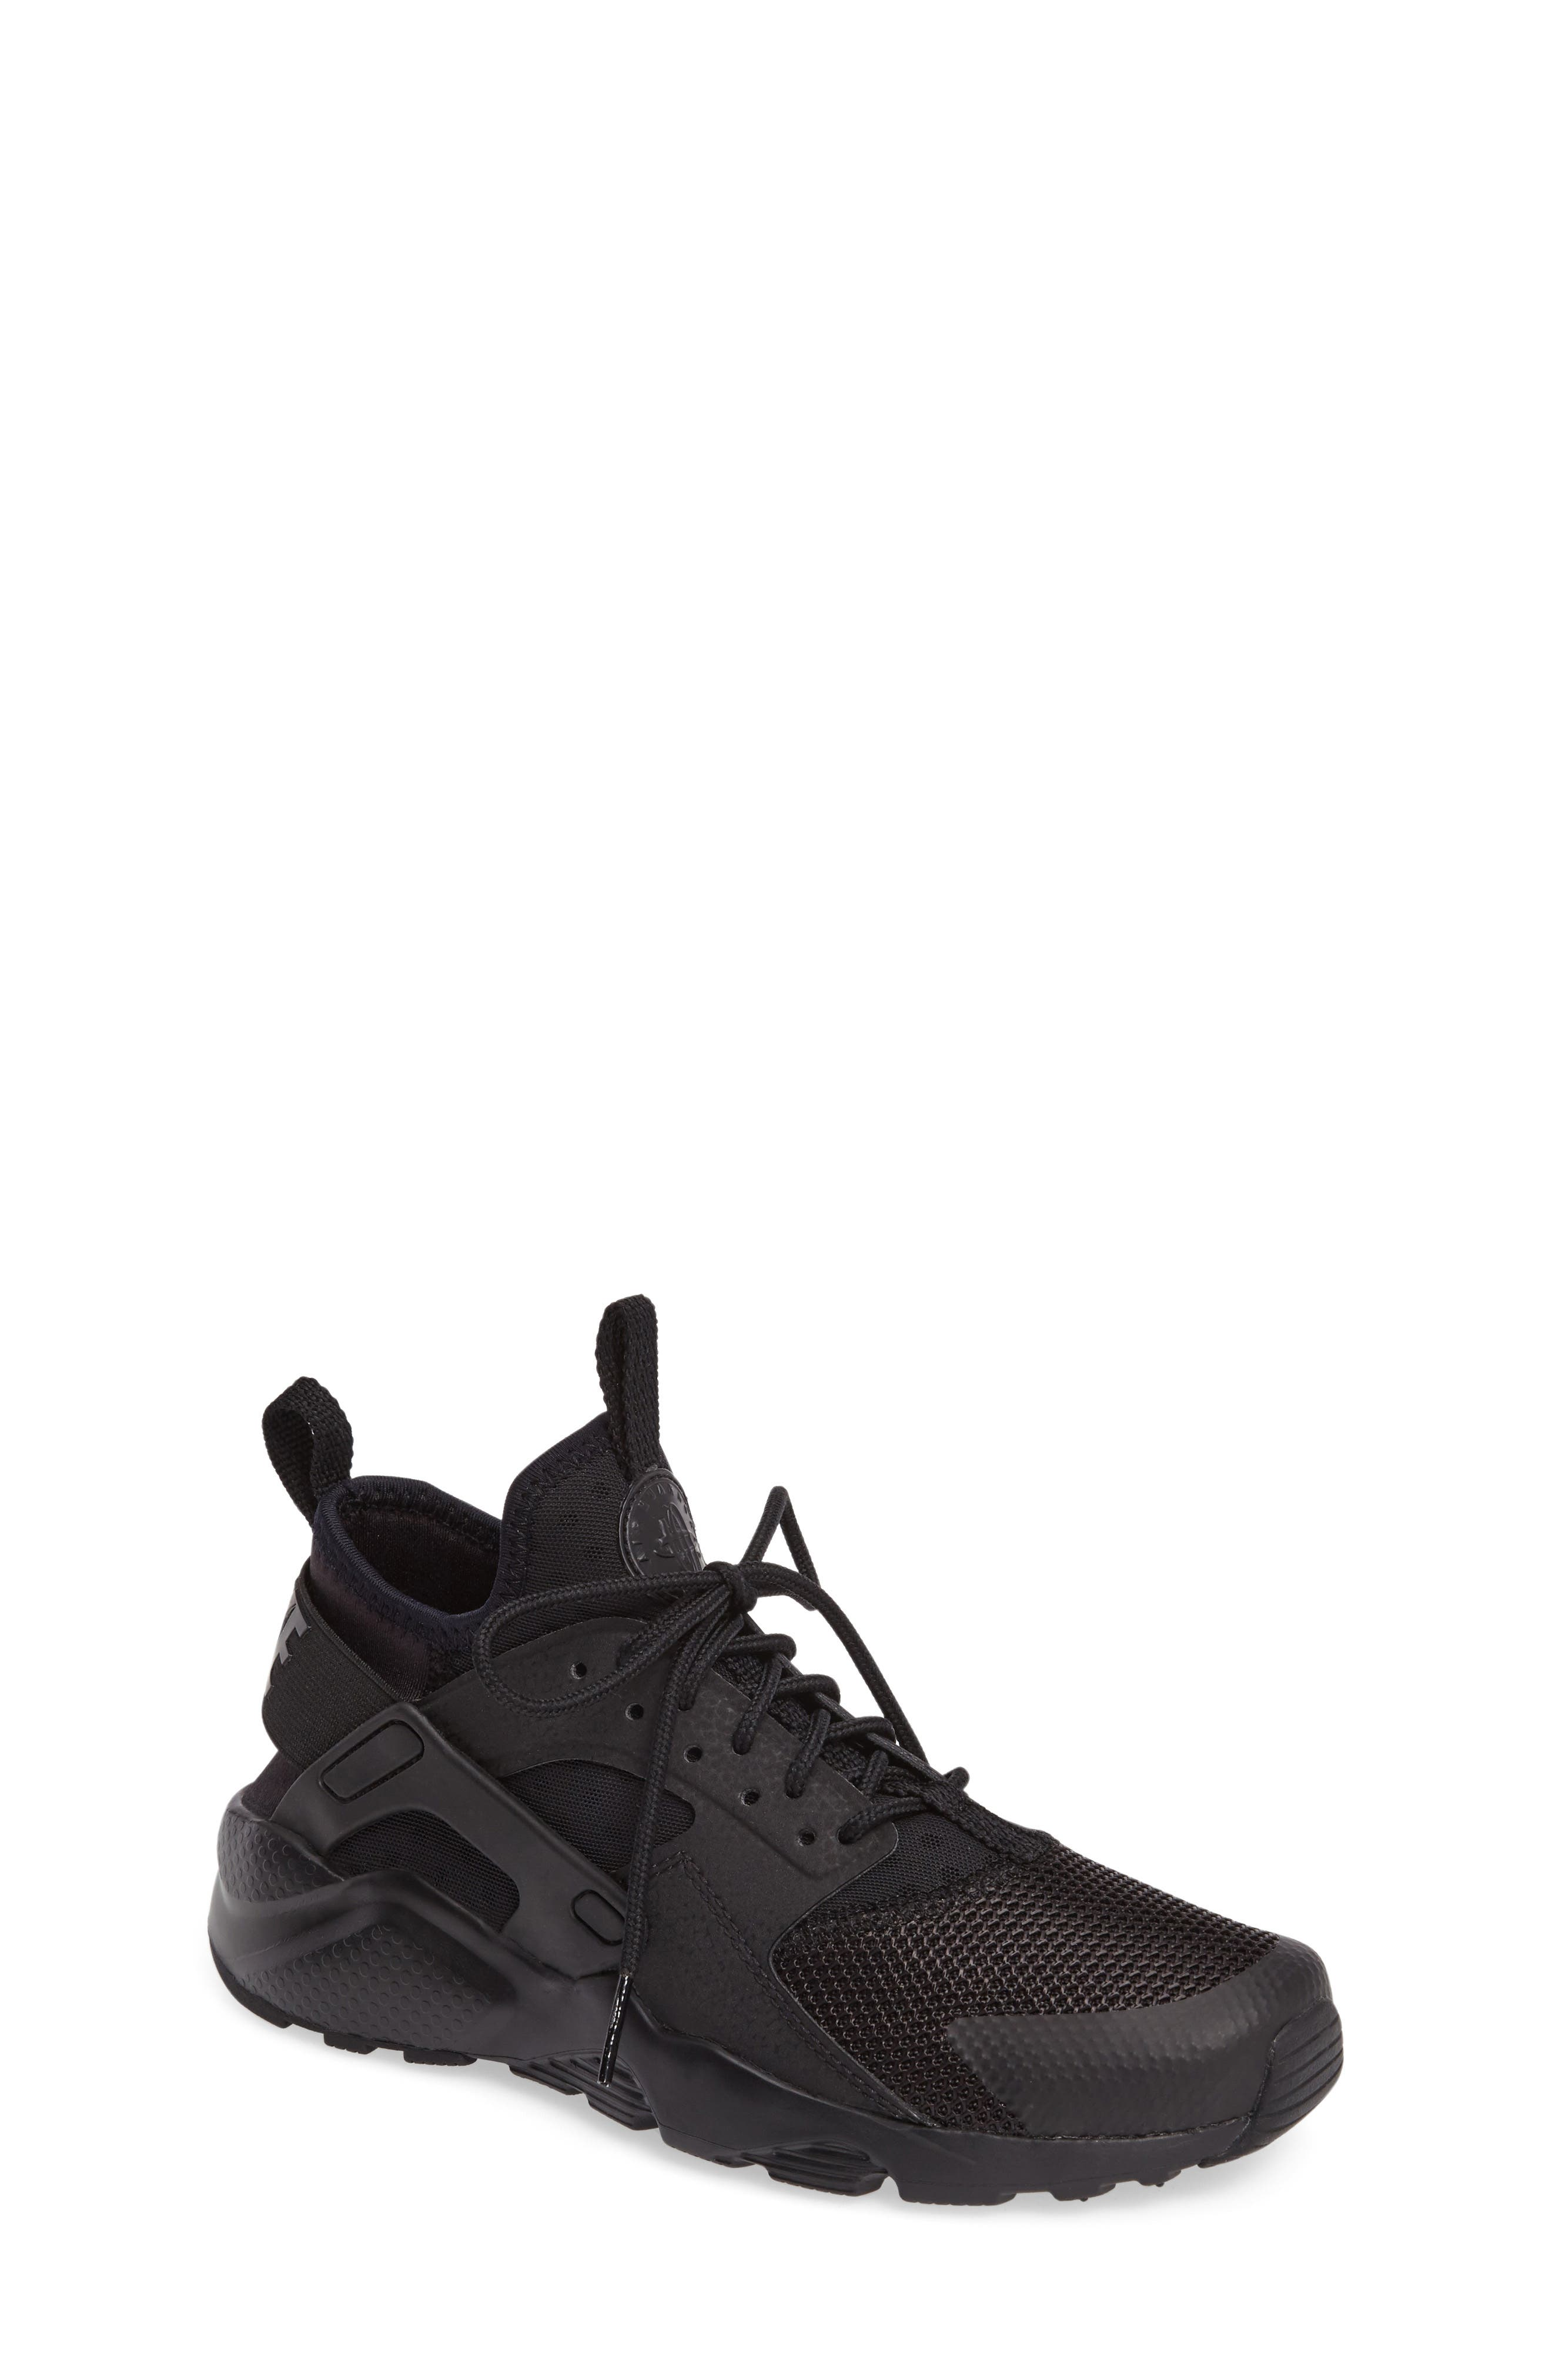 Main Image - Nike Air Huarache Run Ultra Sneaker (Big Kid)